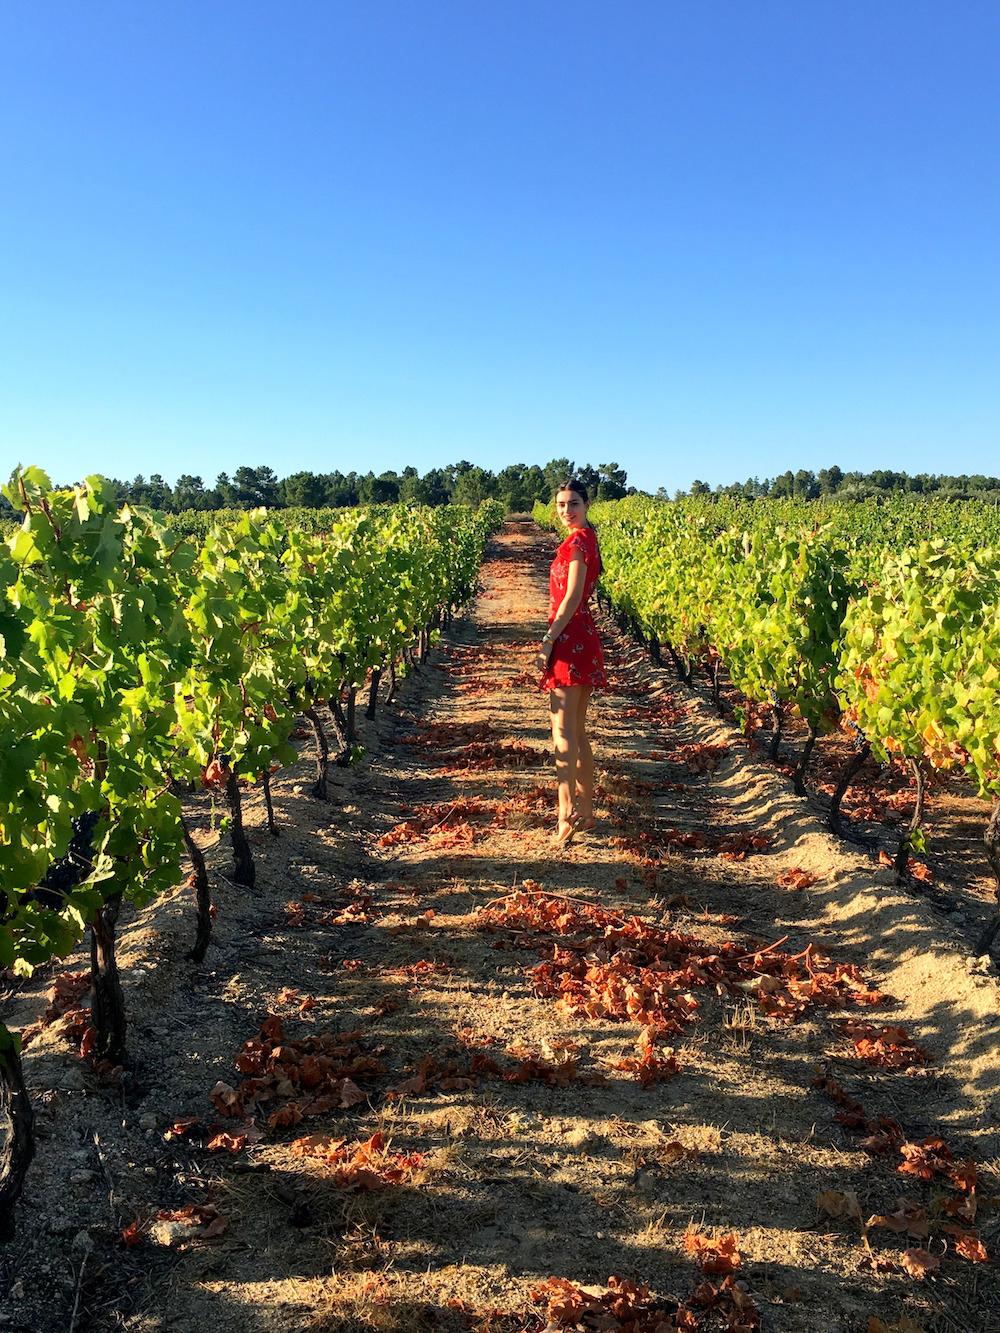 vineyard peexo travel blogger portugal